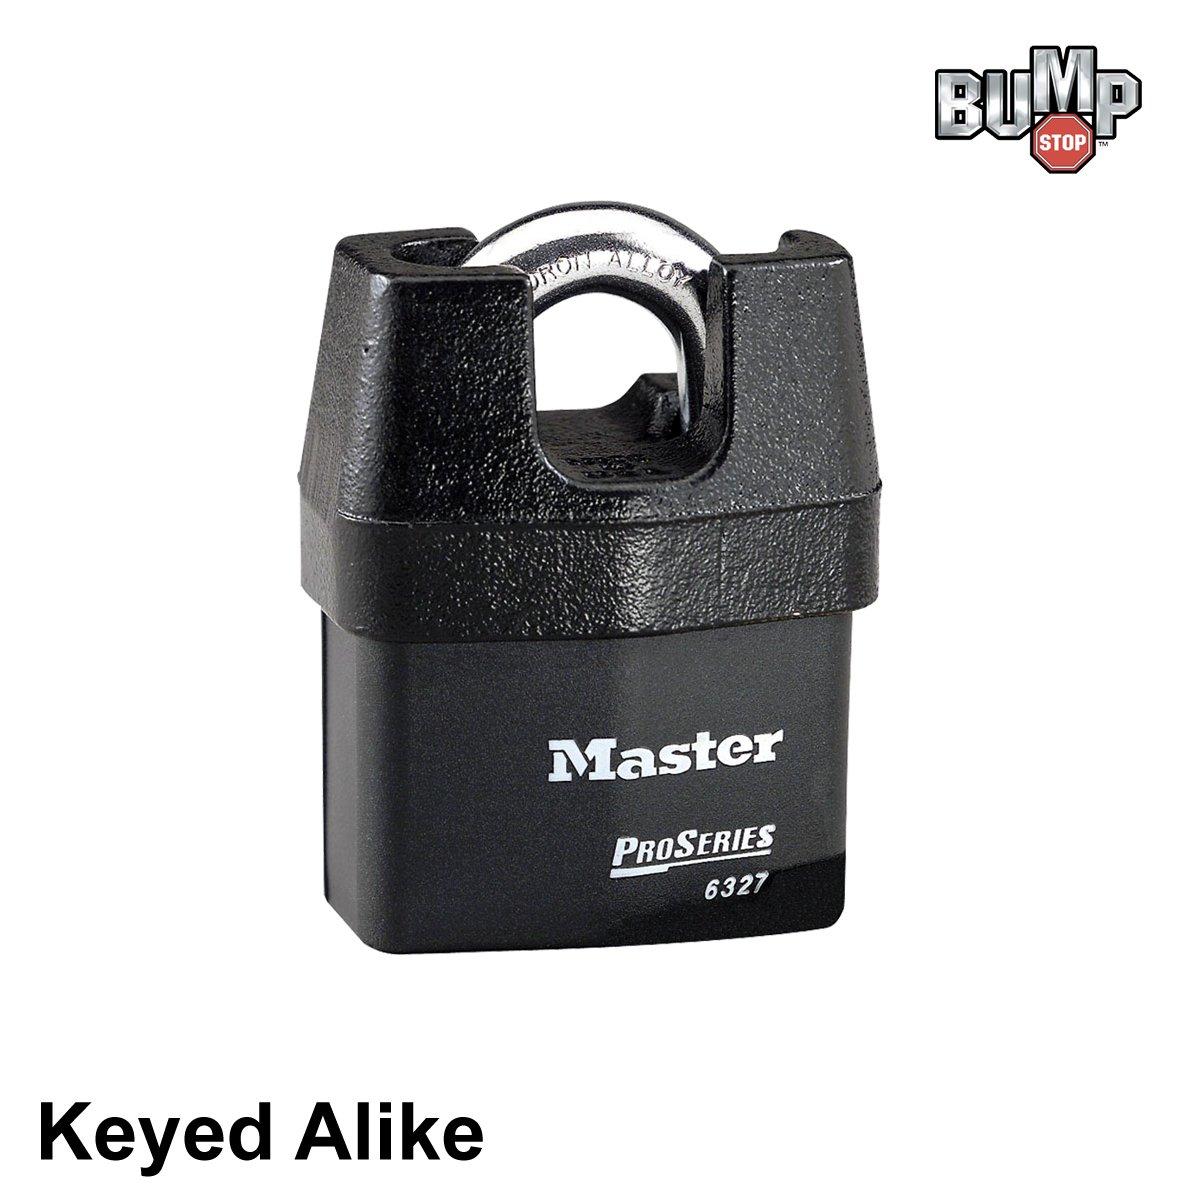 Master Lock Pro Series - High Security Keyed Alike Padlock 6327NKA - w/ BumpStop Technology